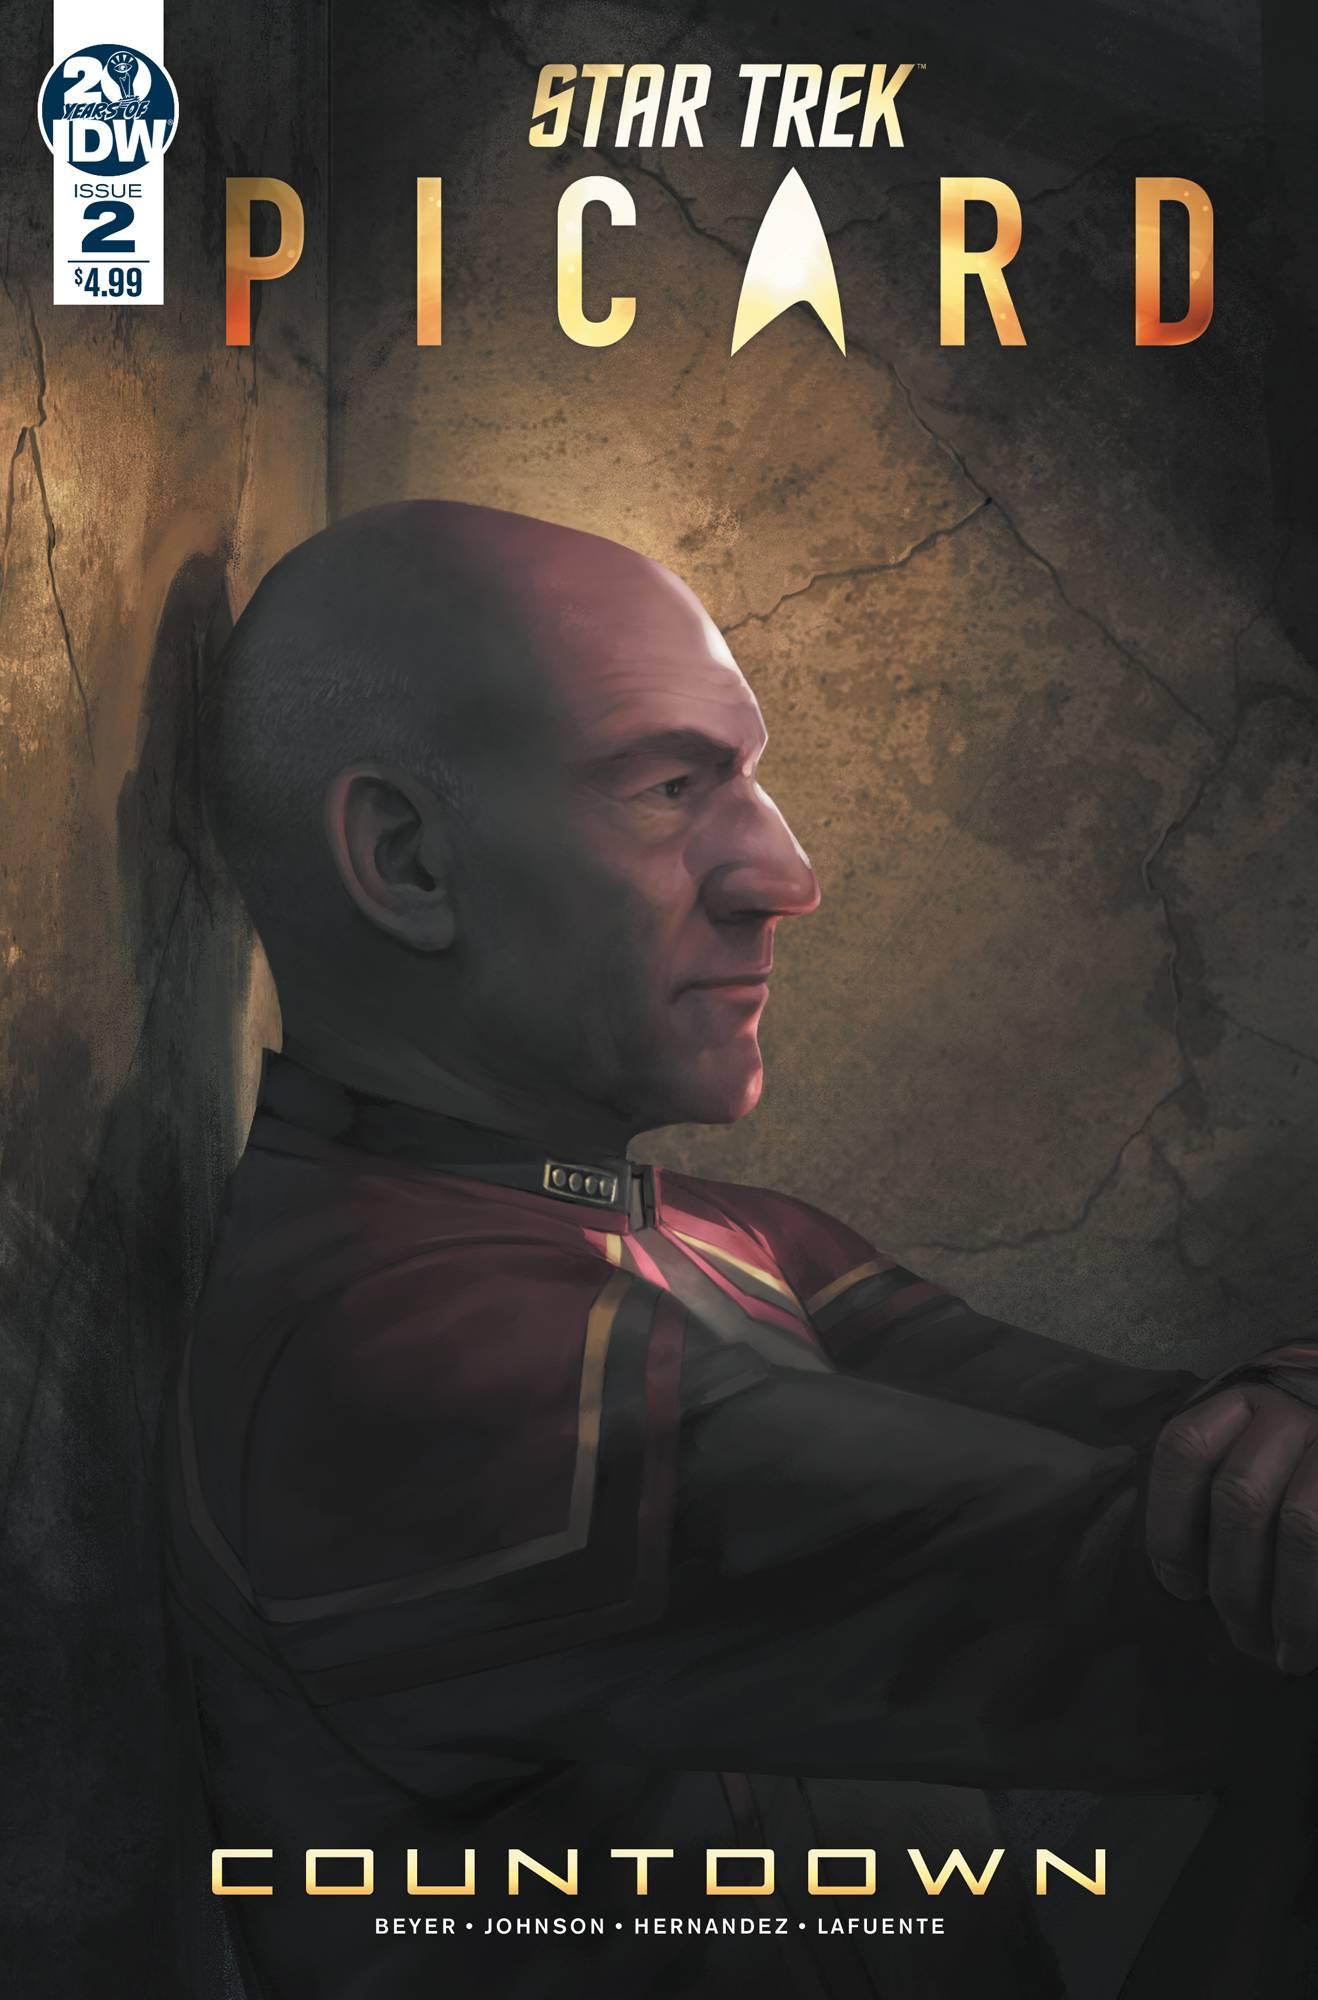 Star Trek: Picard #2 (2019)